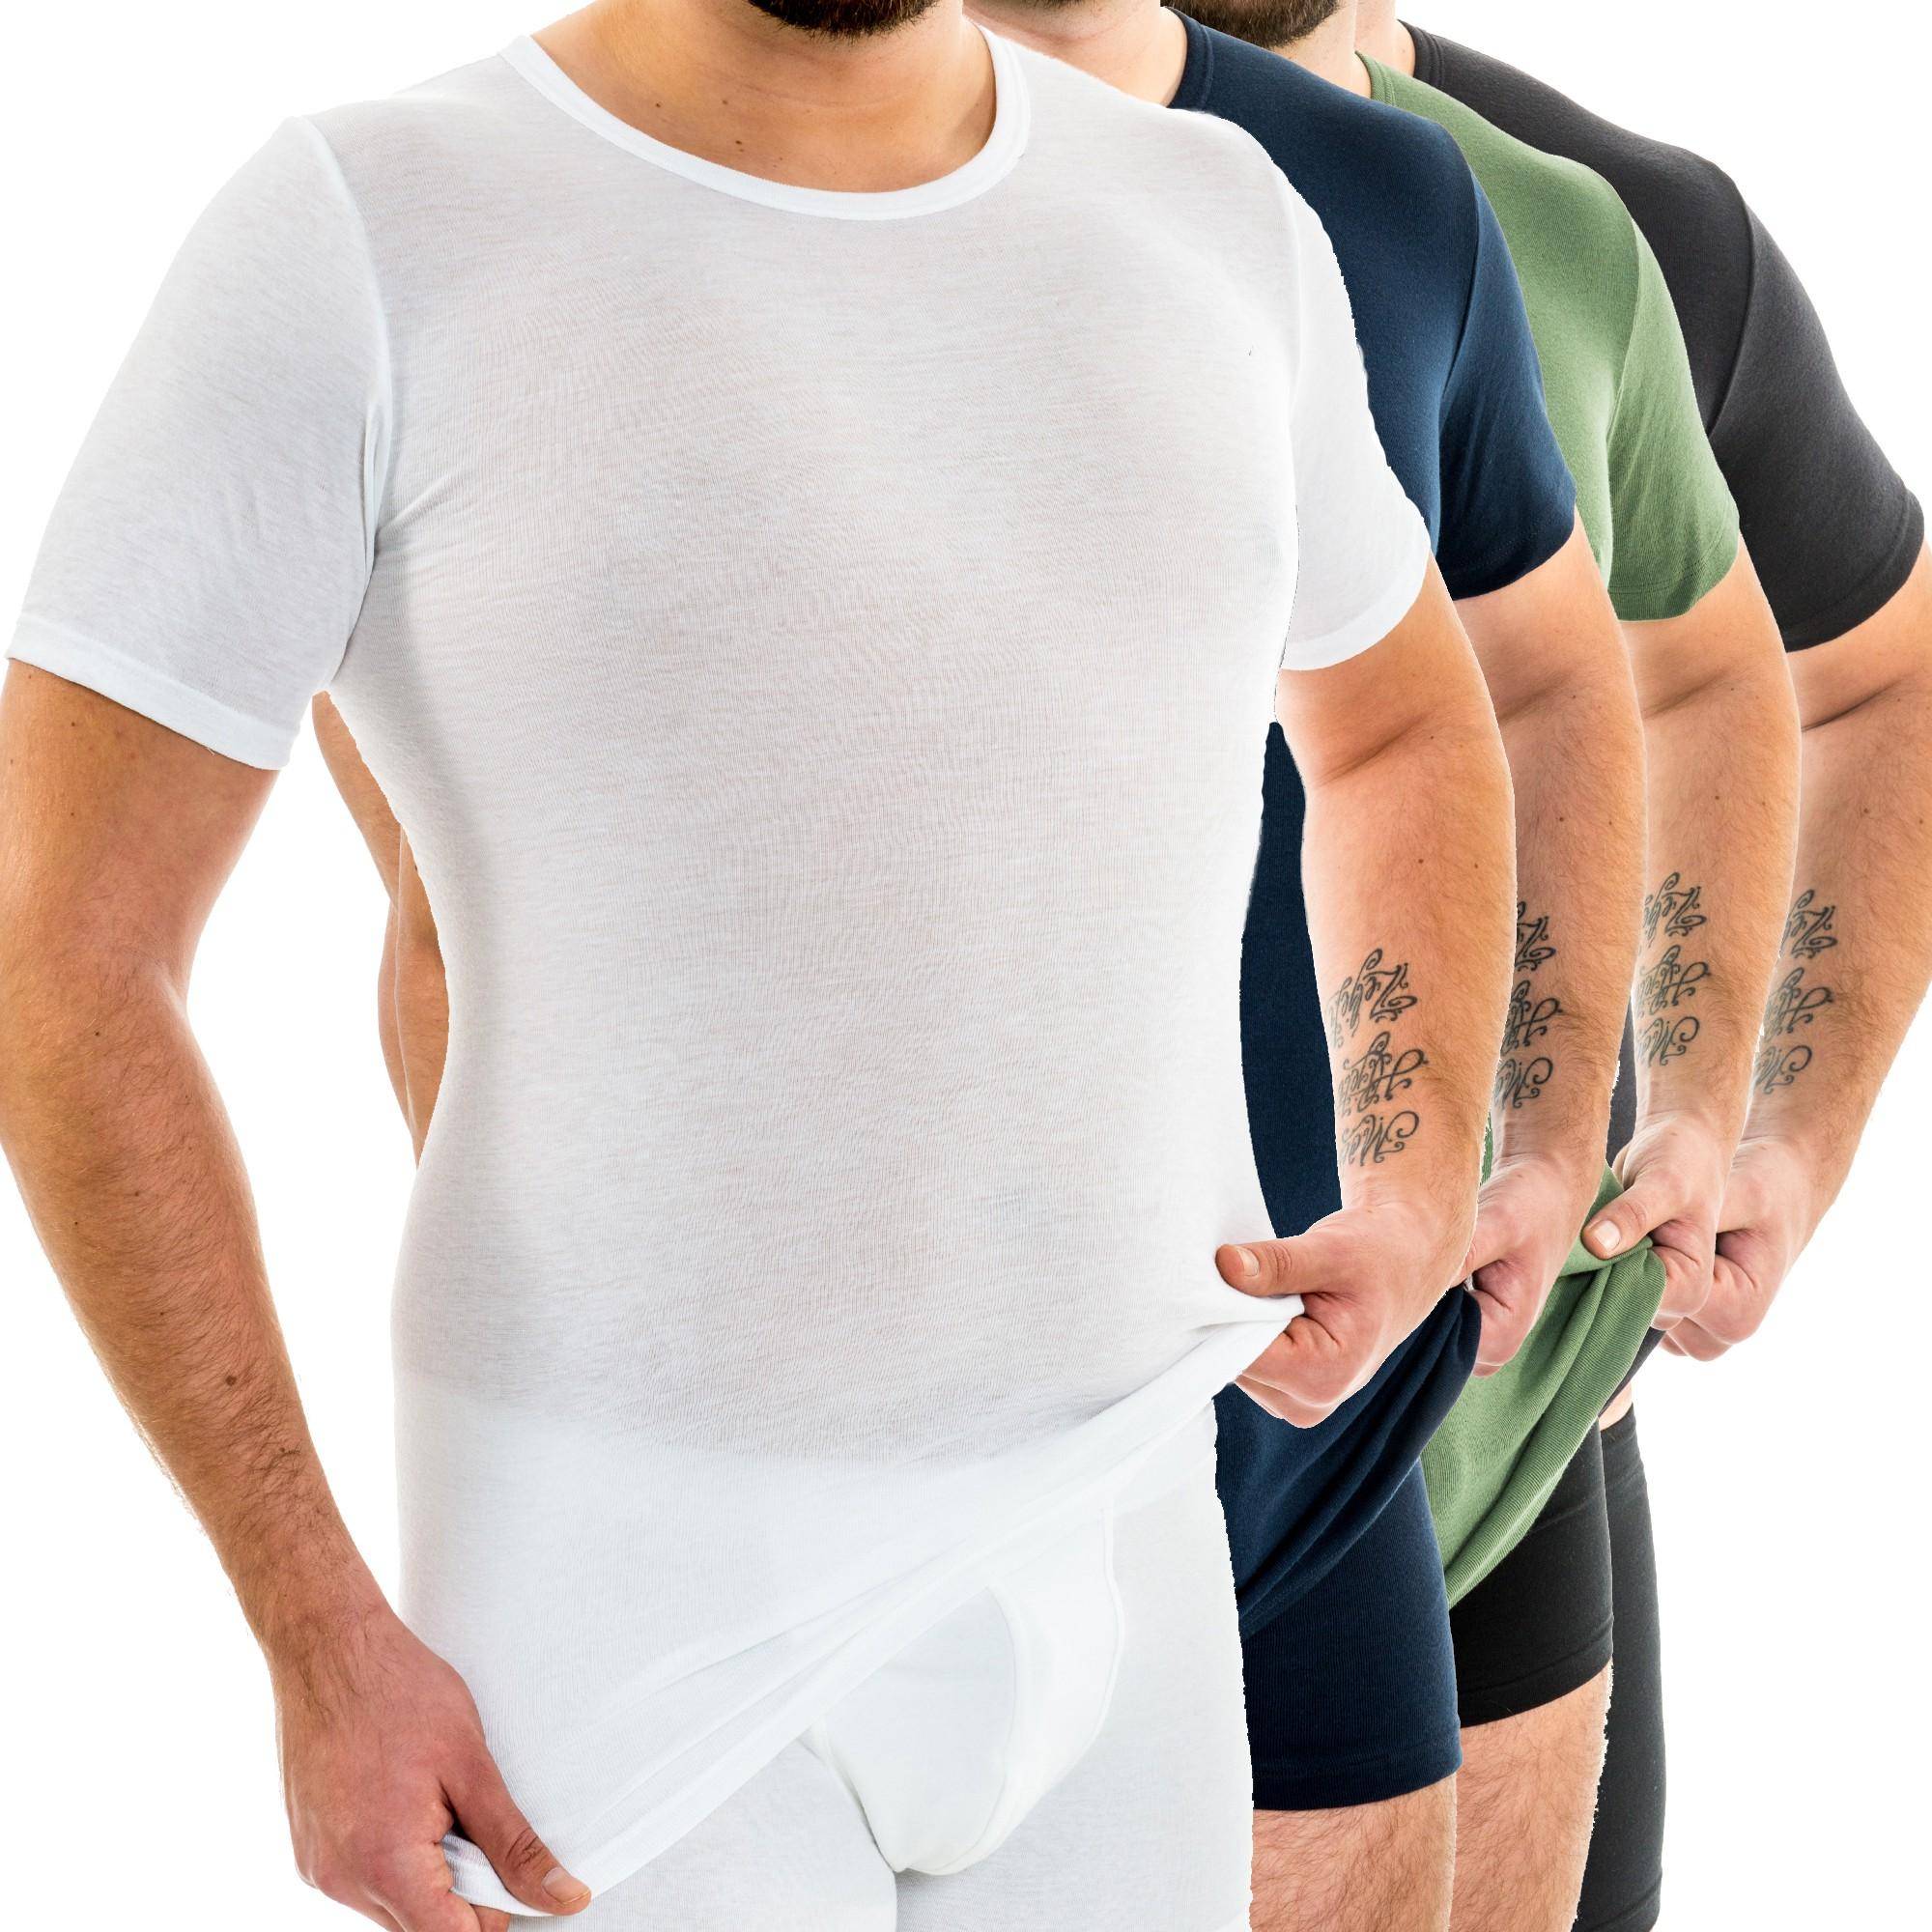 ad96ad8f5ce11e HERMKO 3847 Extralanges Herren kurzarm Shirt